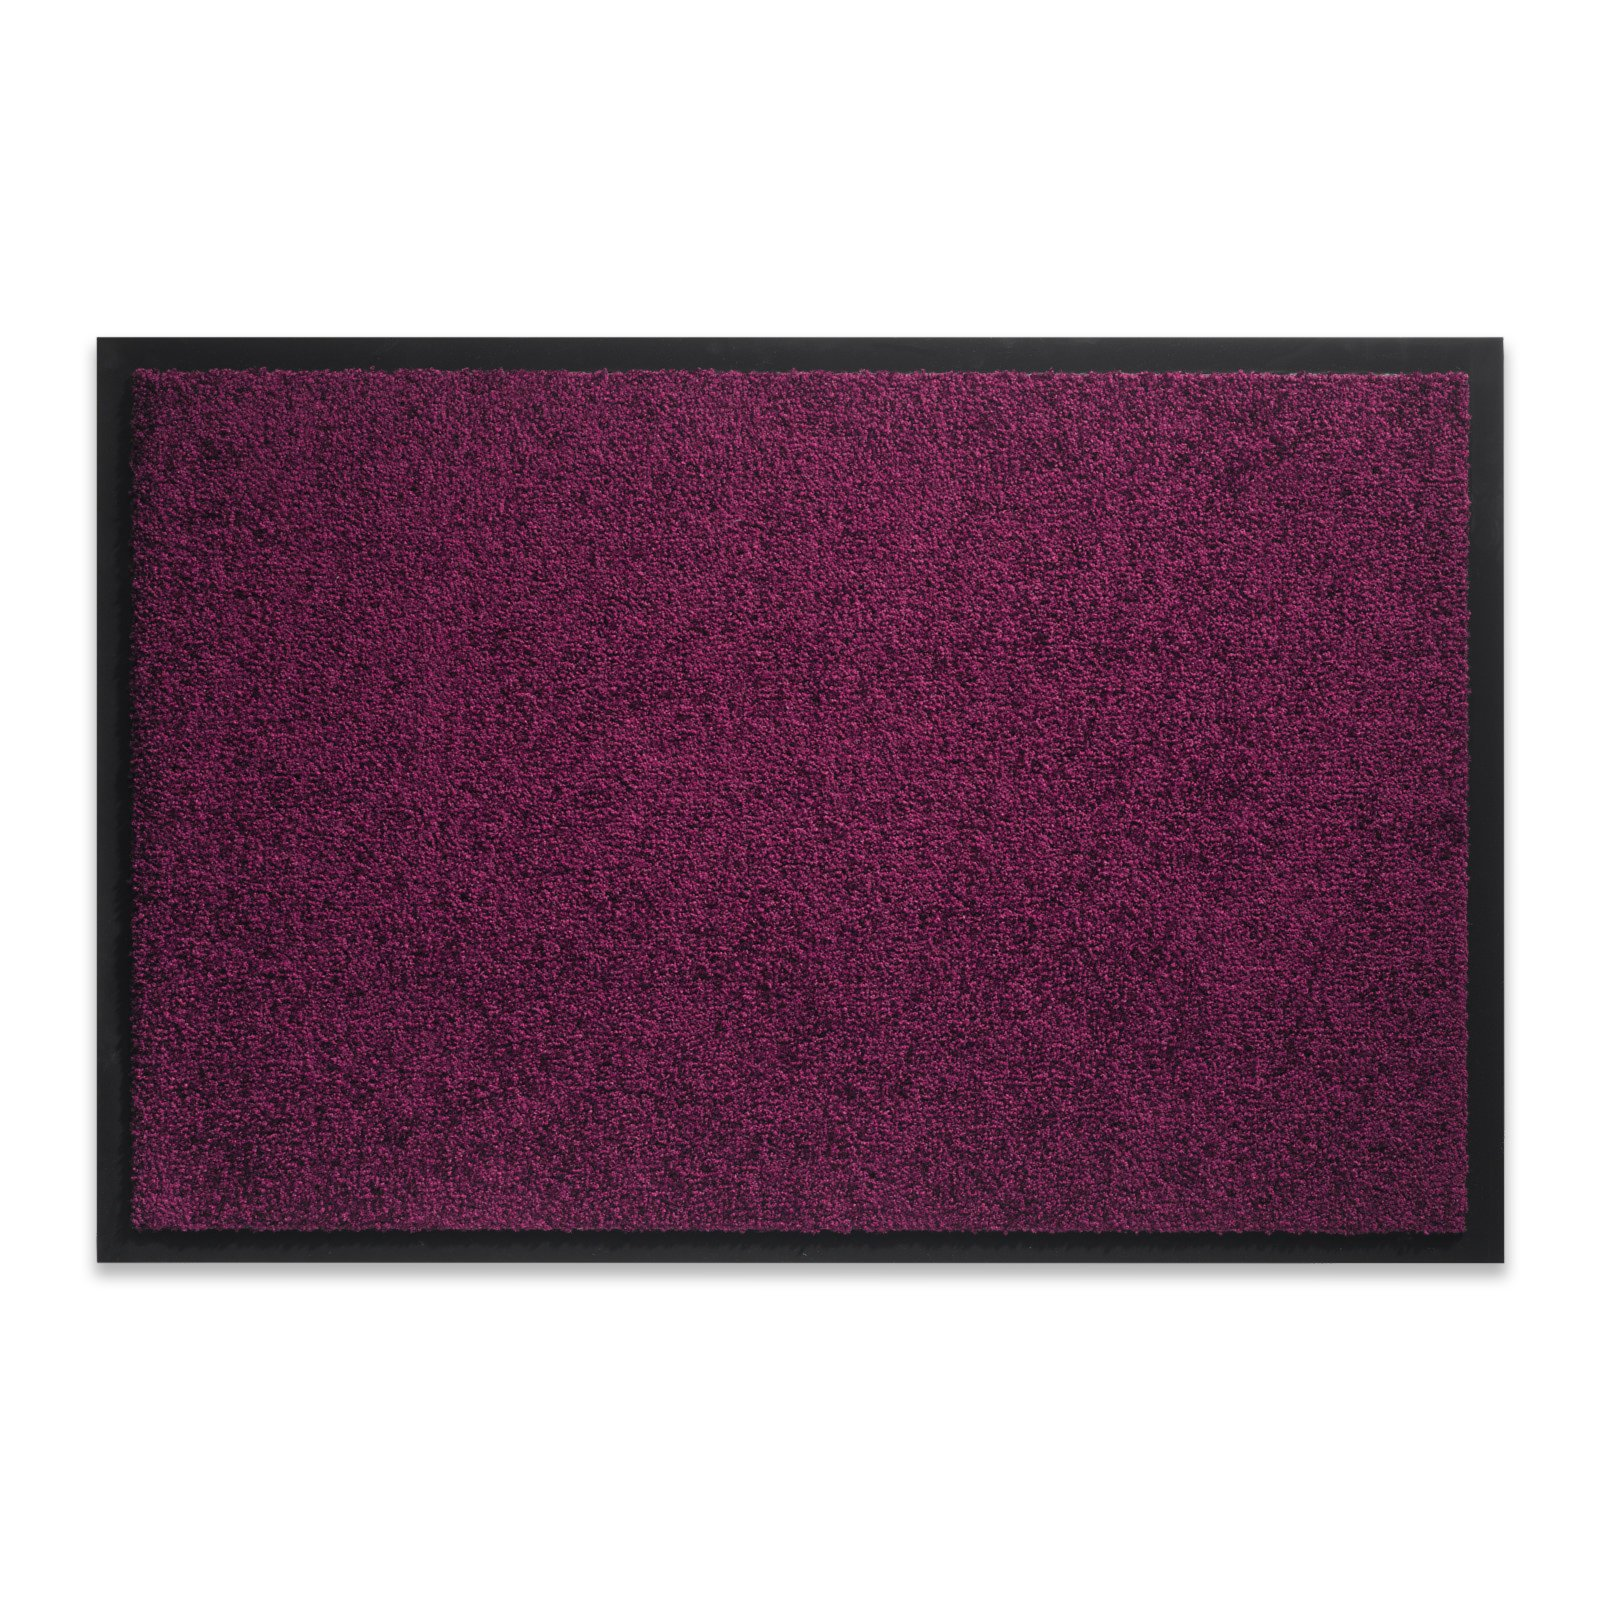 Fußmatte TWISTER - purple - 90x60 cm